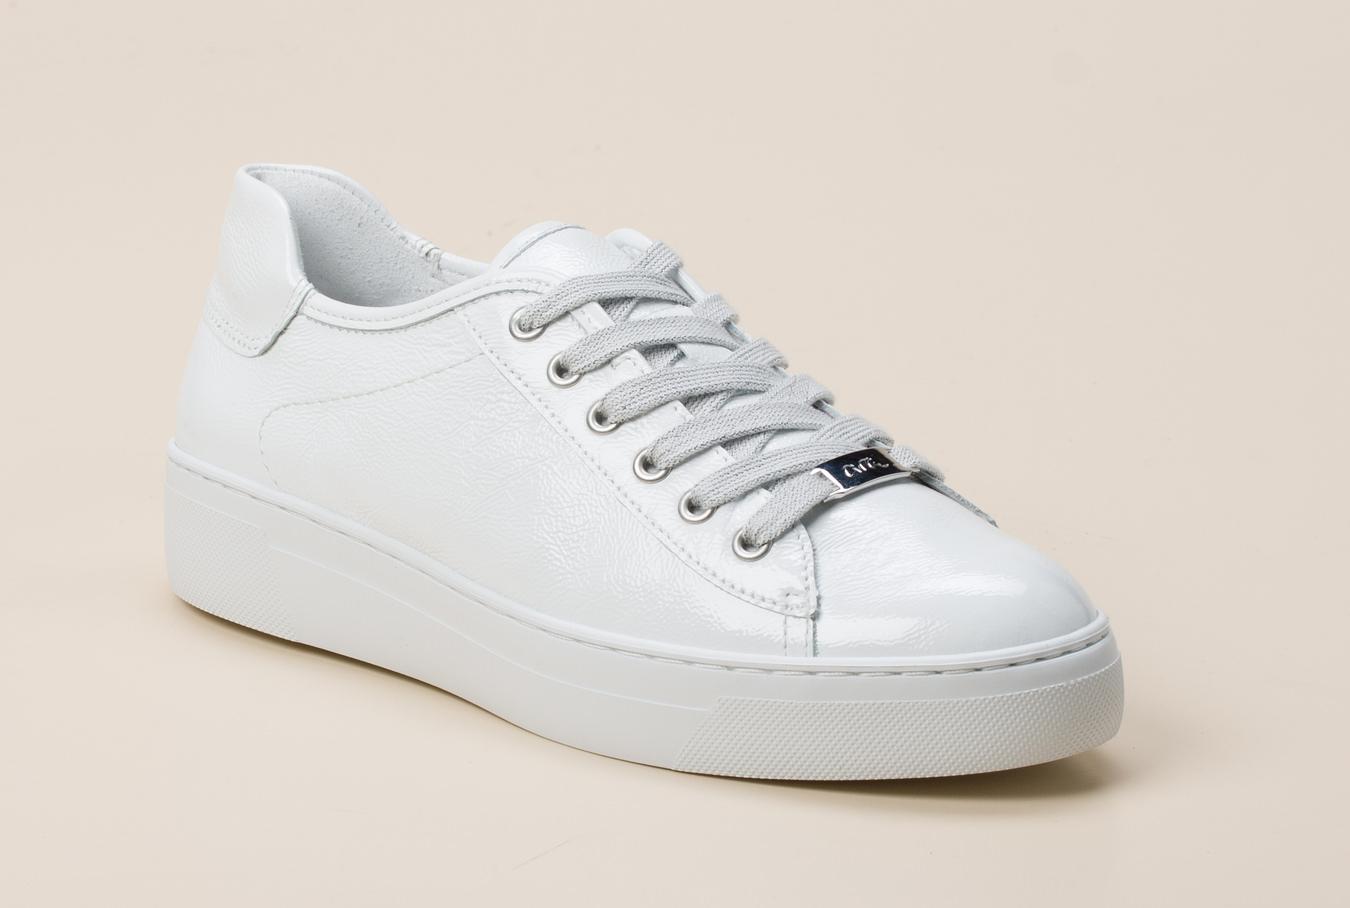 824fa0686d0890 Ara Damen Sneaker in weiß kaufen